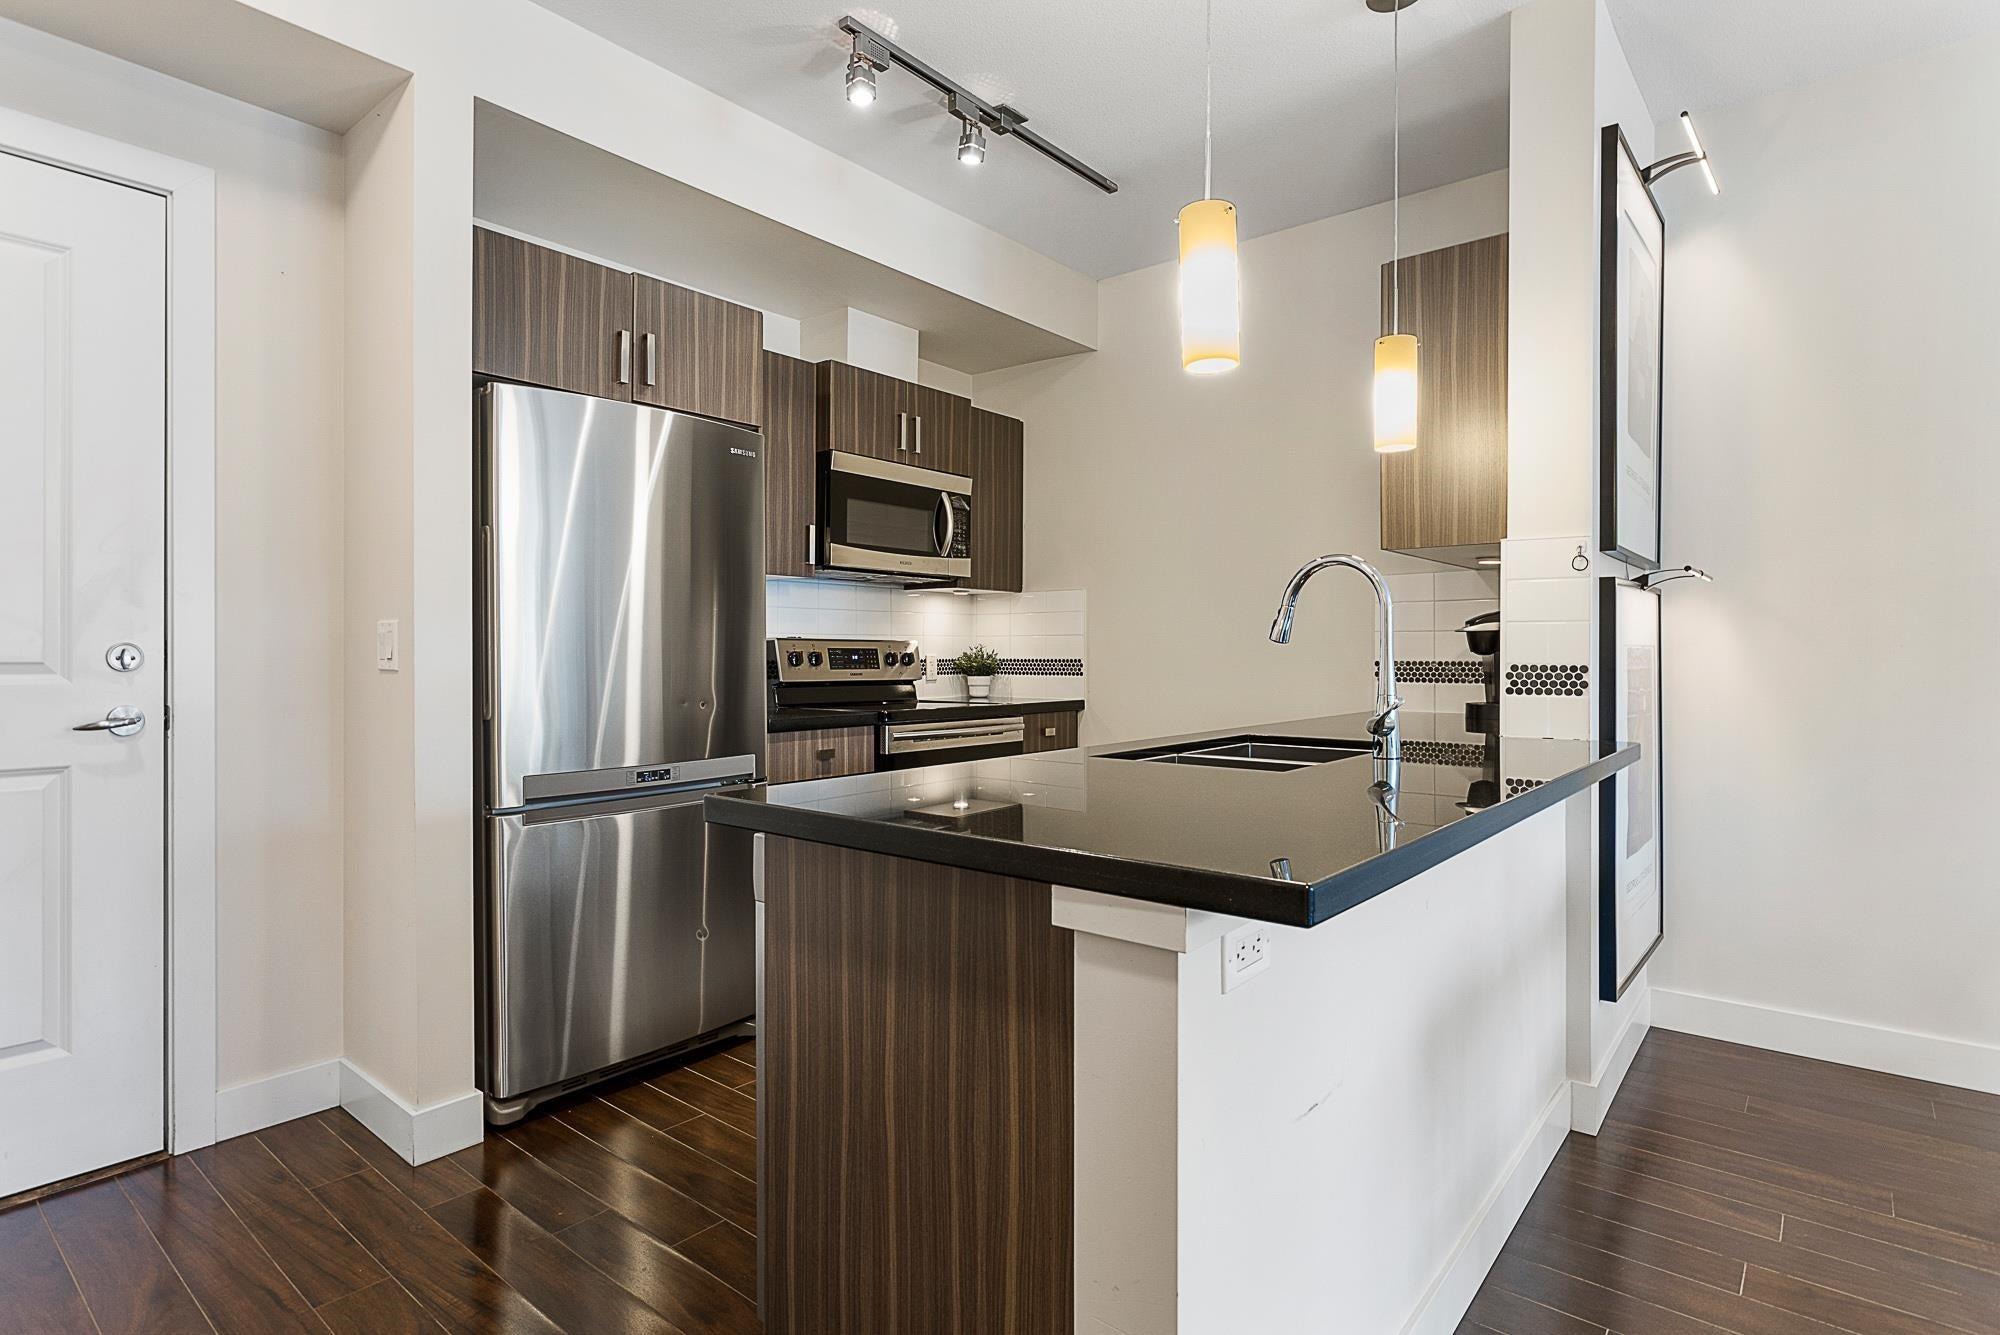 114 20219 54A AVENUE - Langley City Apartment/Condo for sale, 1 Bedroom (R2616172) - #8